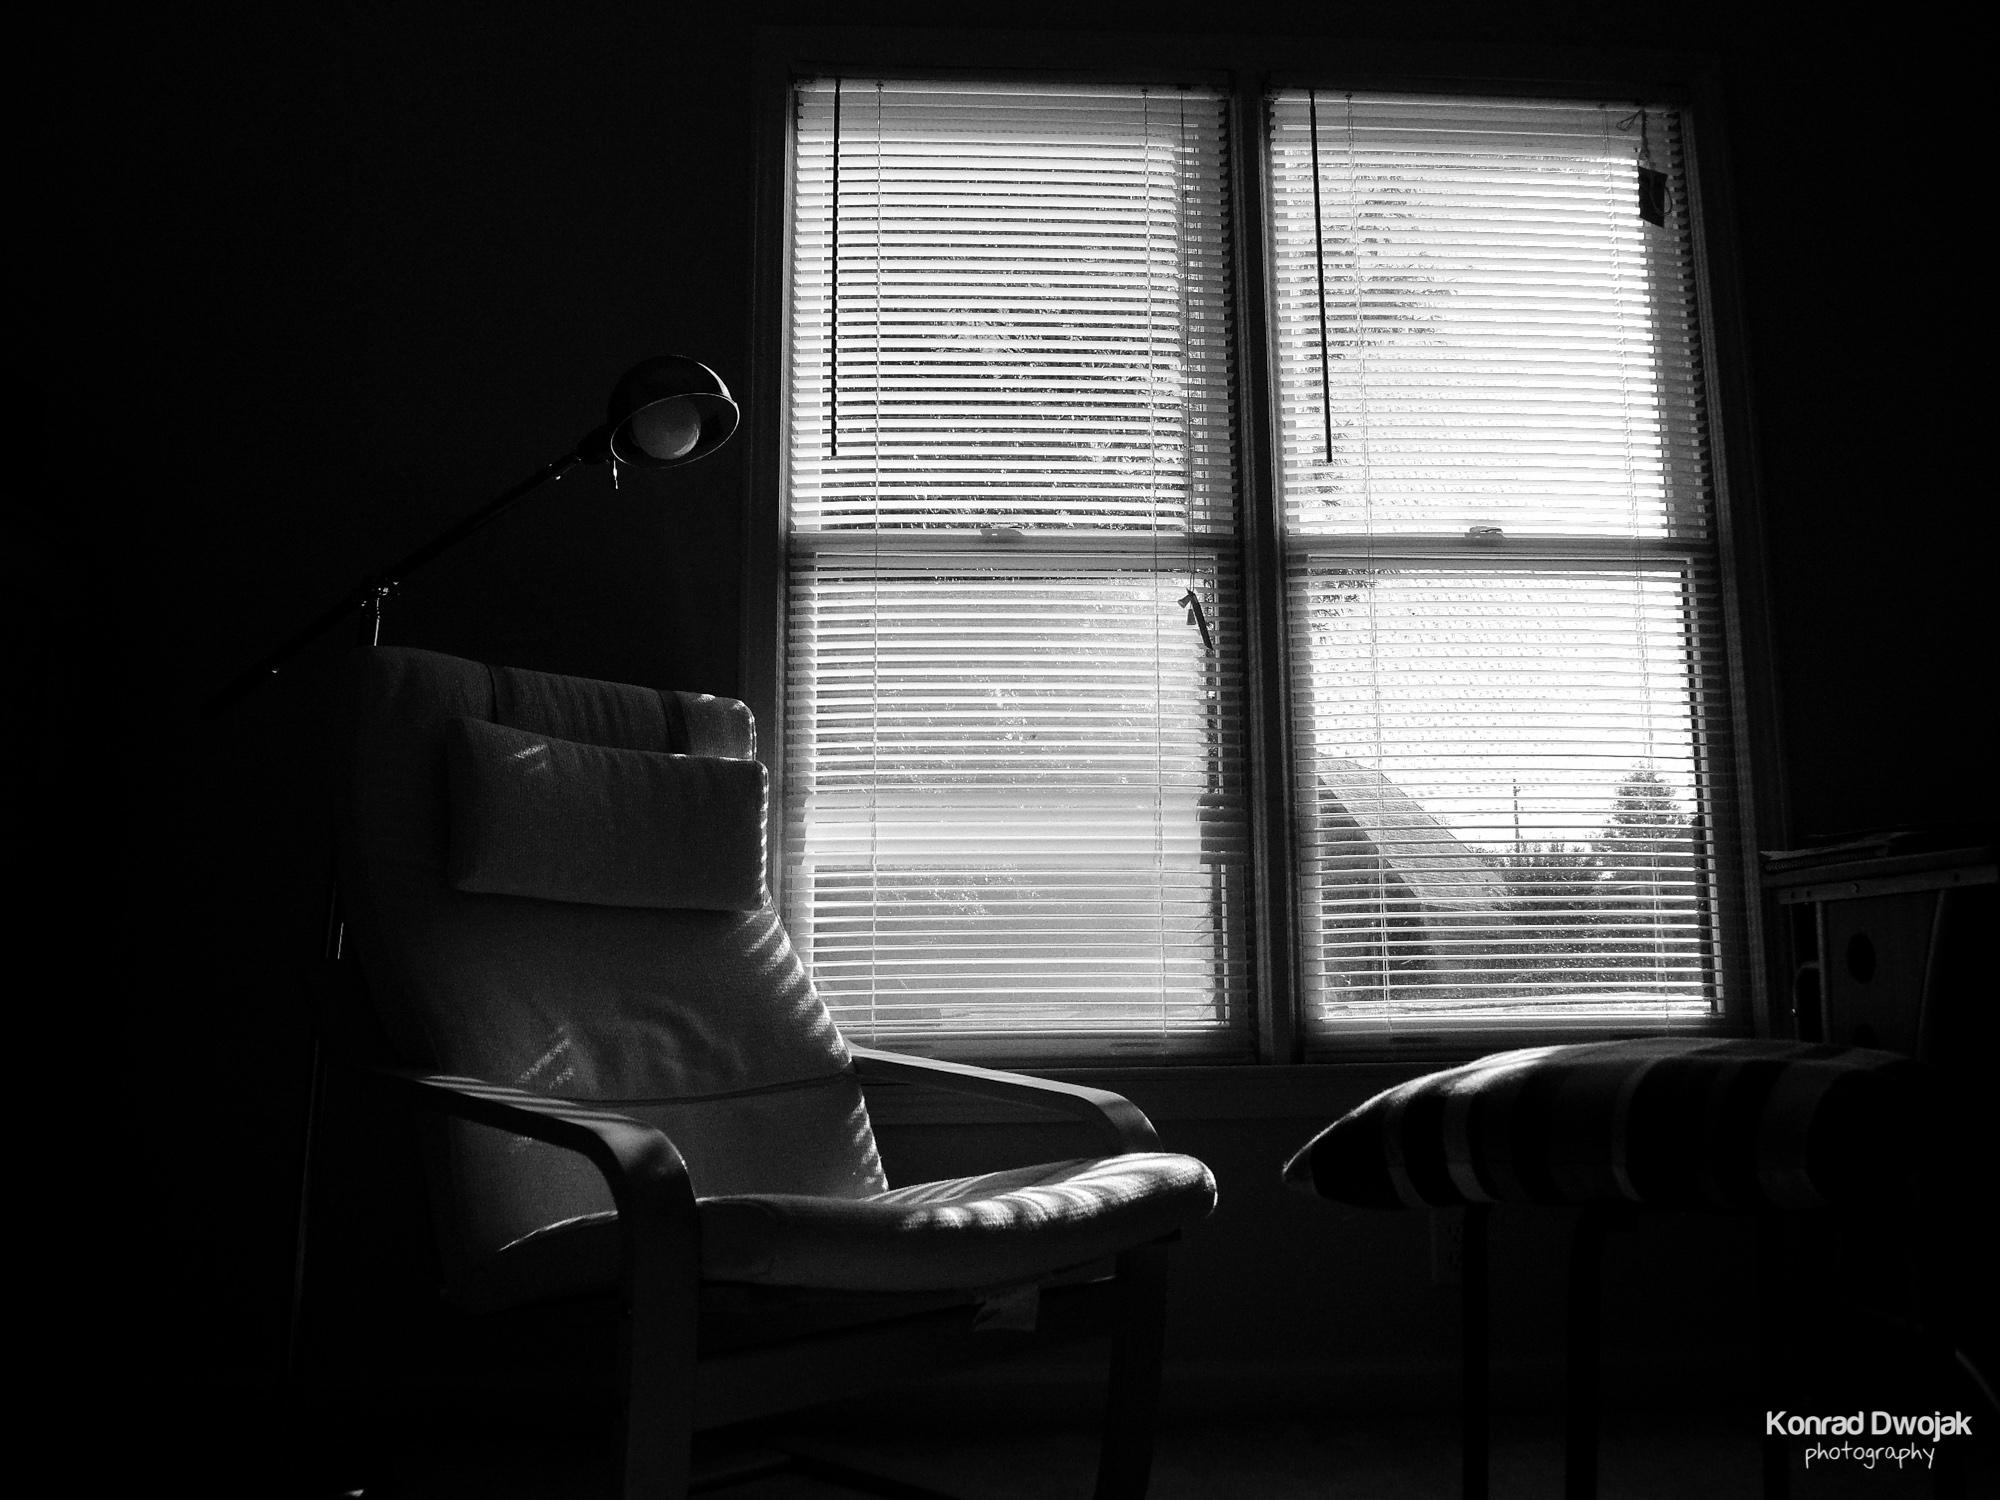 Morning view-7.jpg